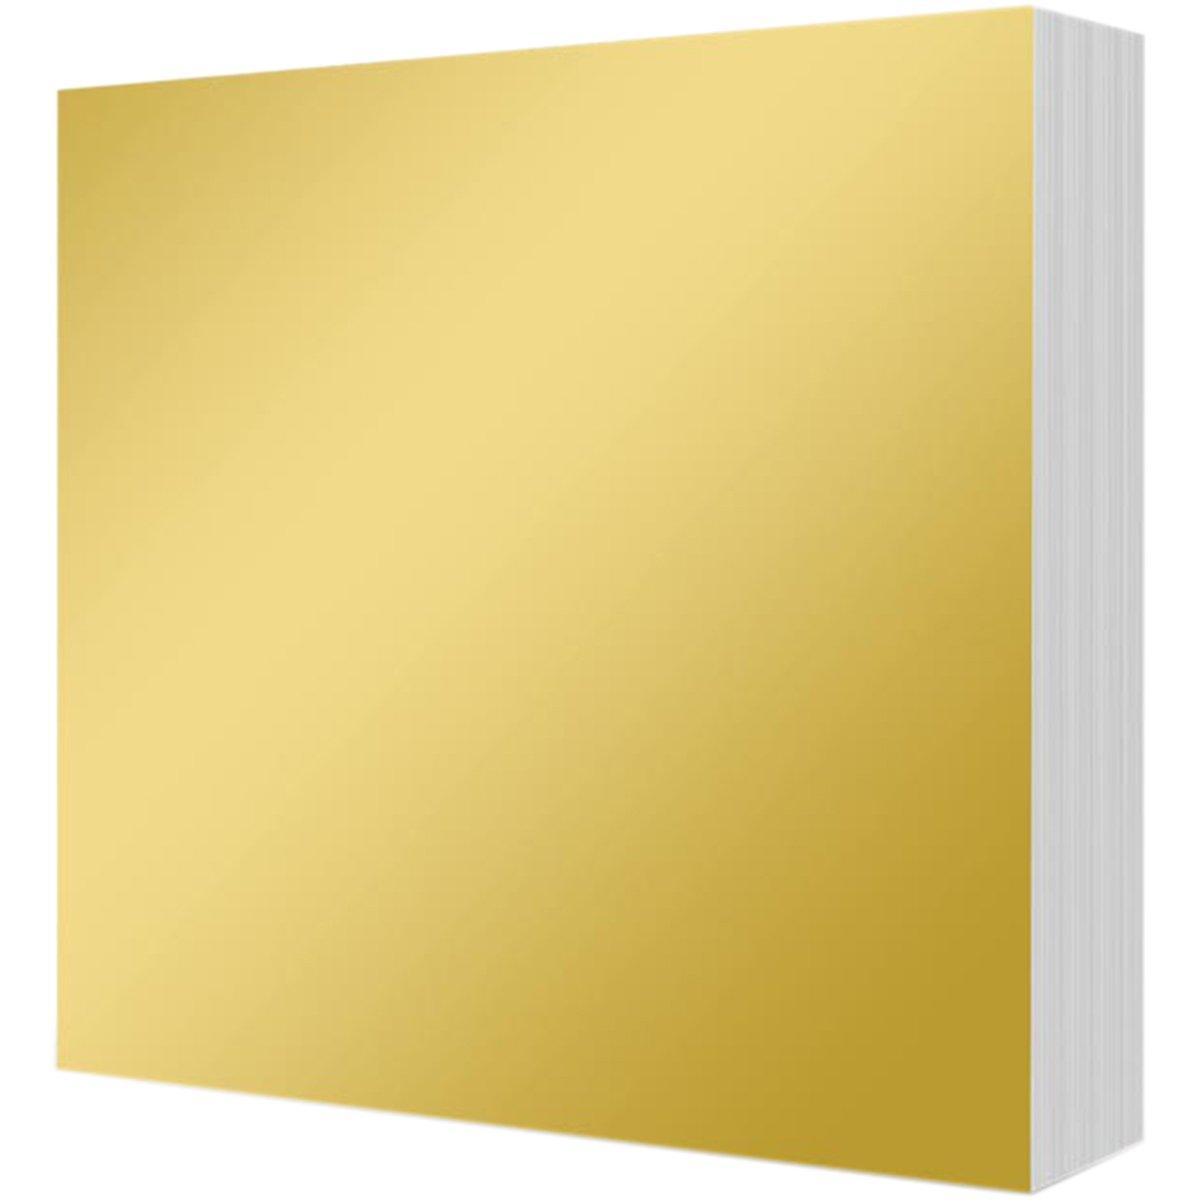 Hunkydory Mirri Matts 100 Mirri Sheets in Rich Gold 6x6' Mirror Board MCDM103 Hunkydory Crafts